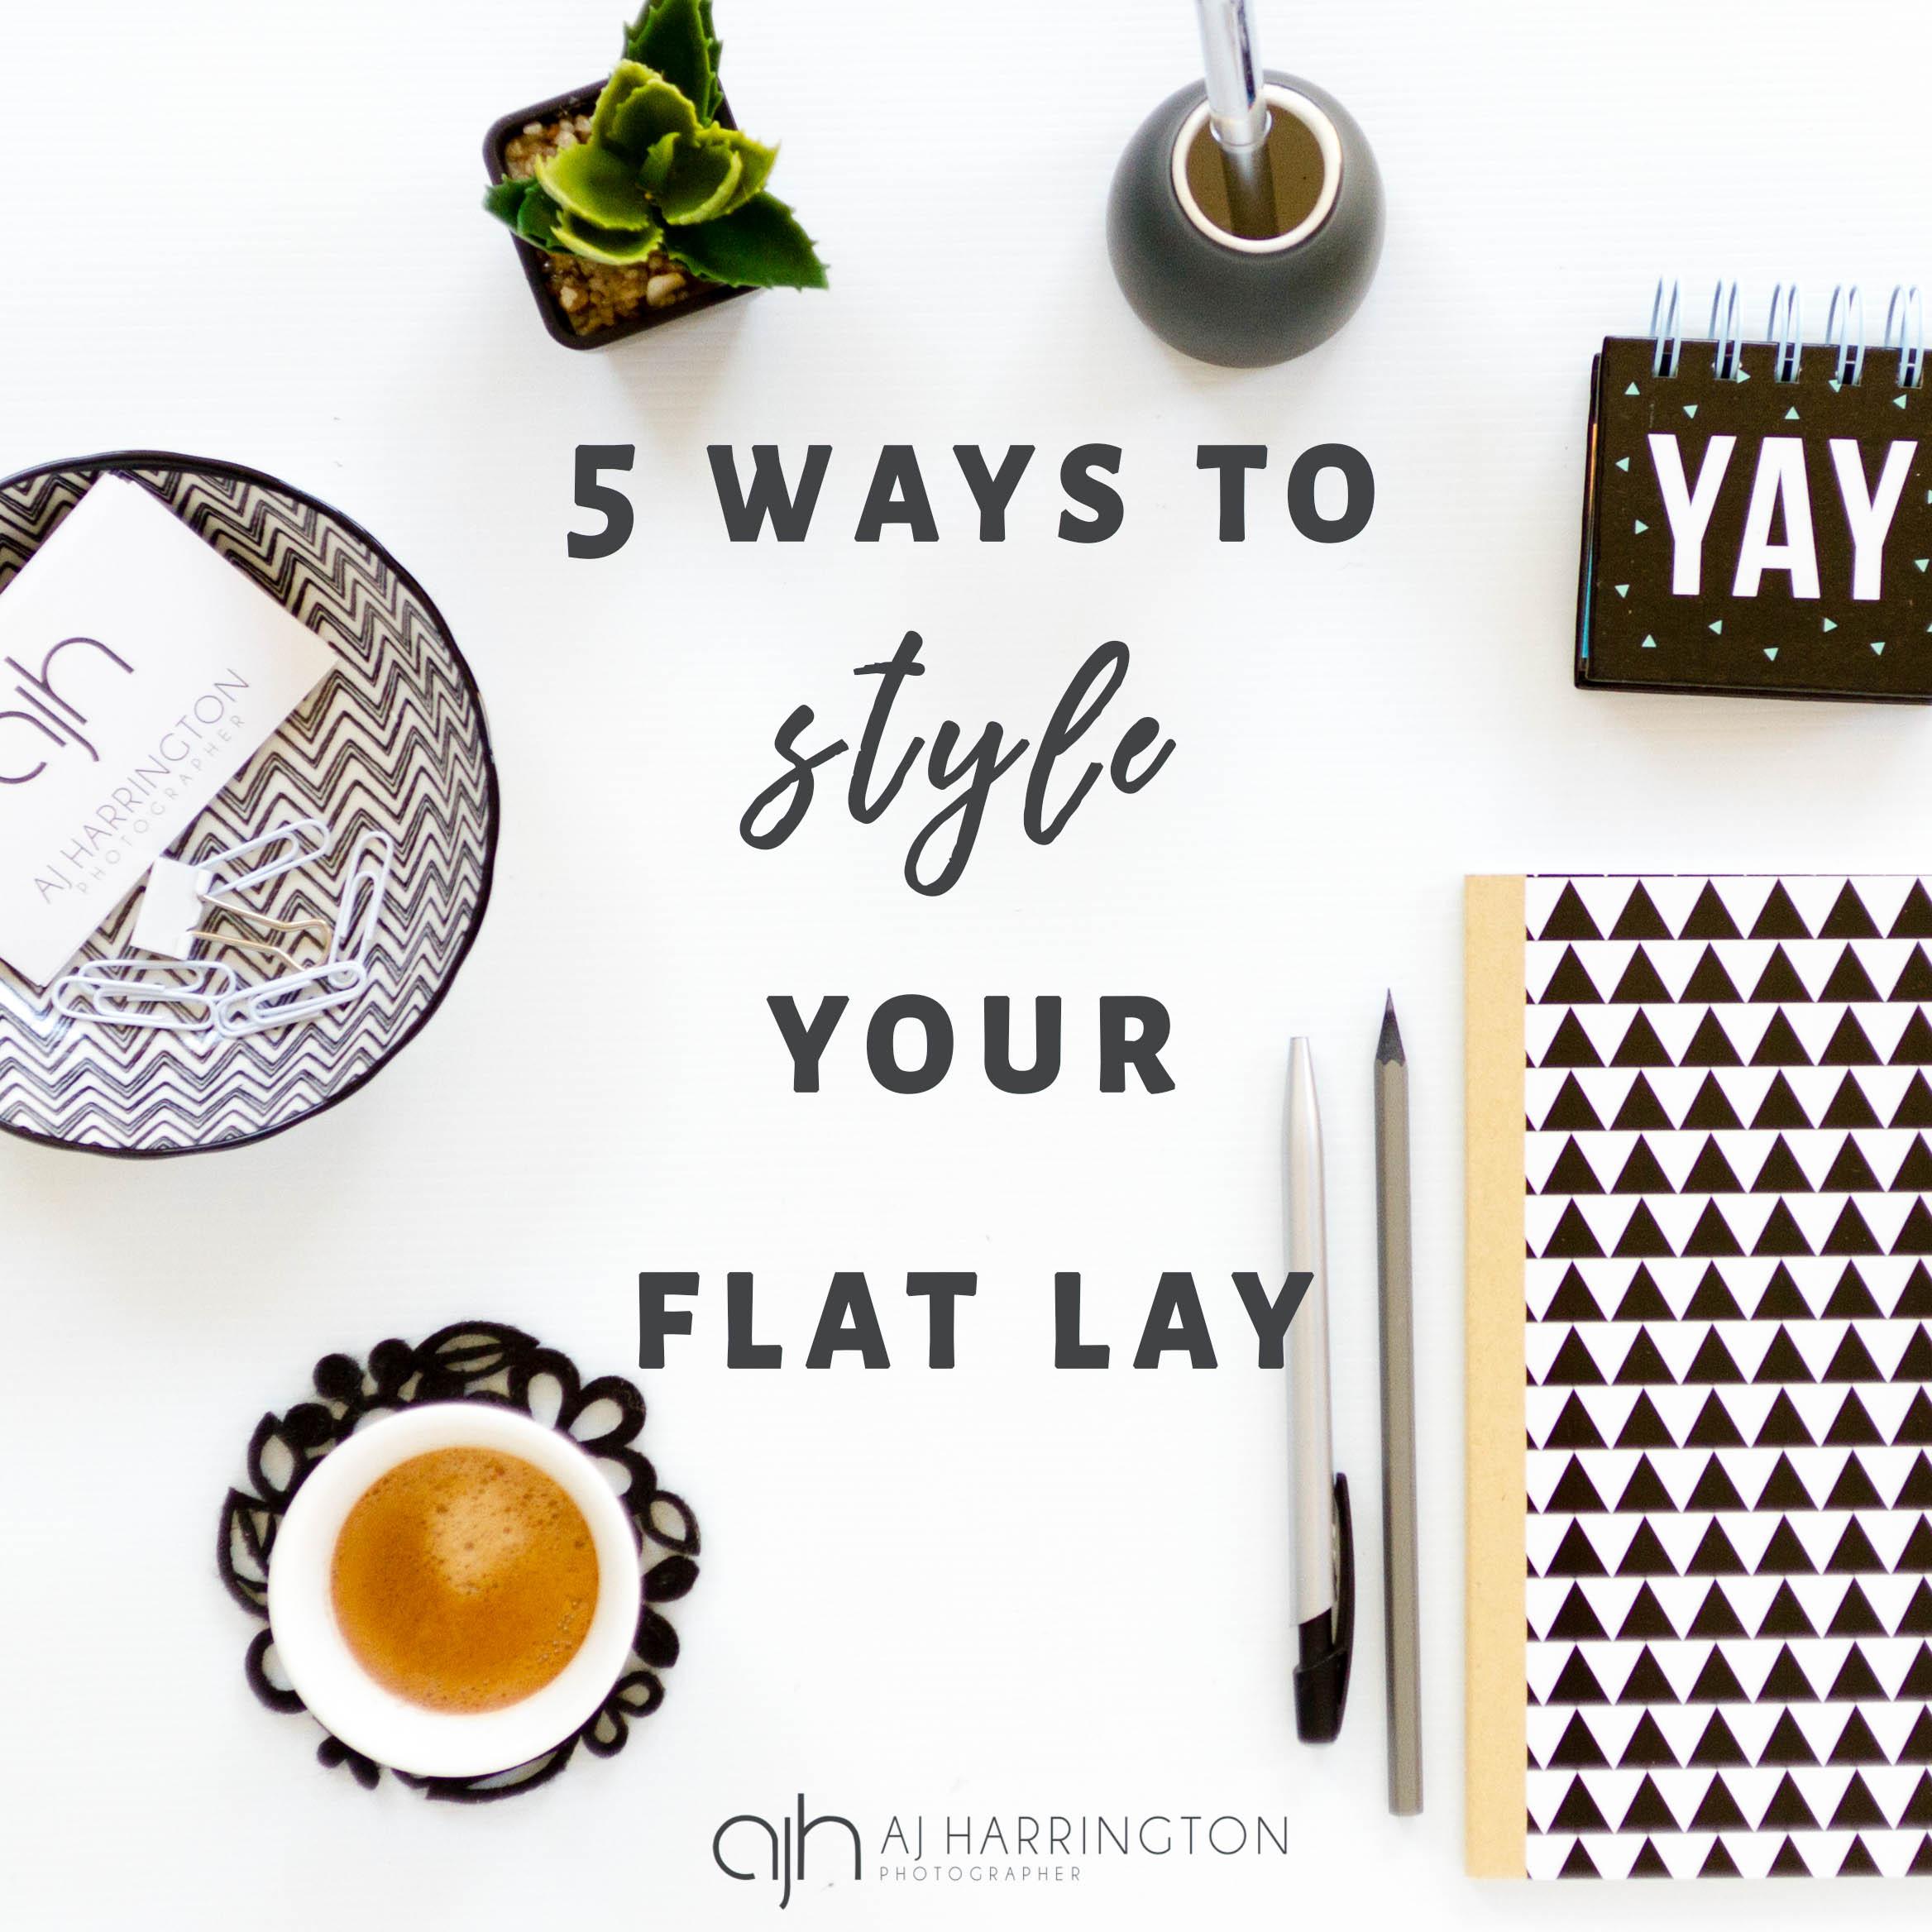 5-way-style-flatlay-2791-edit